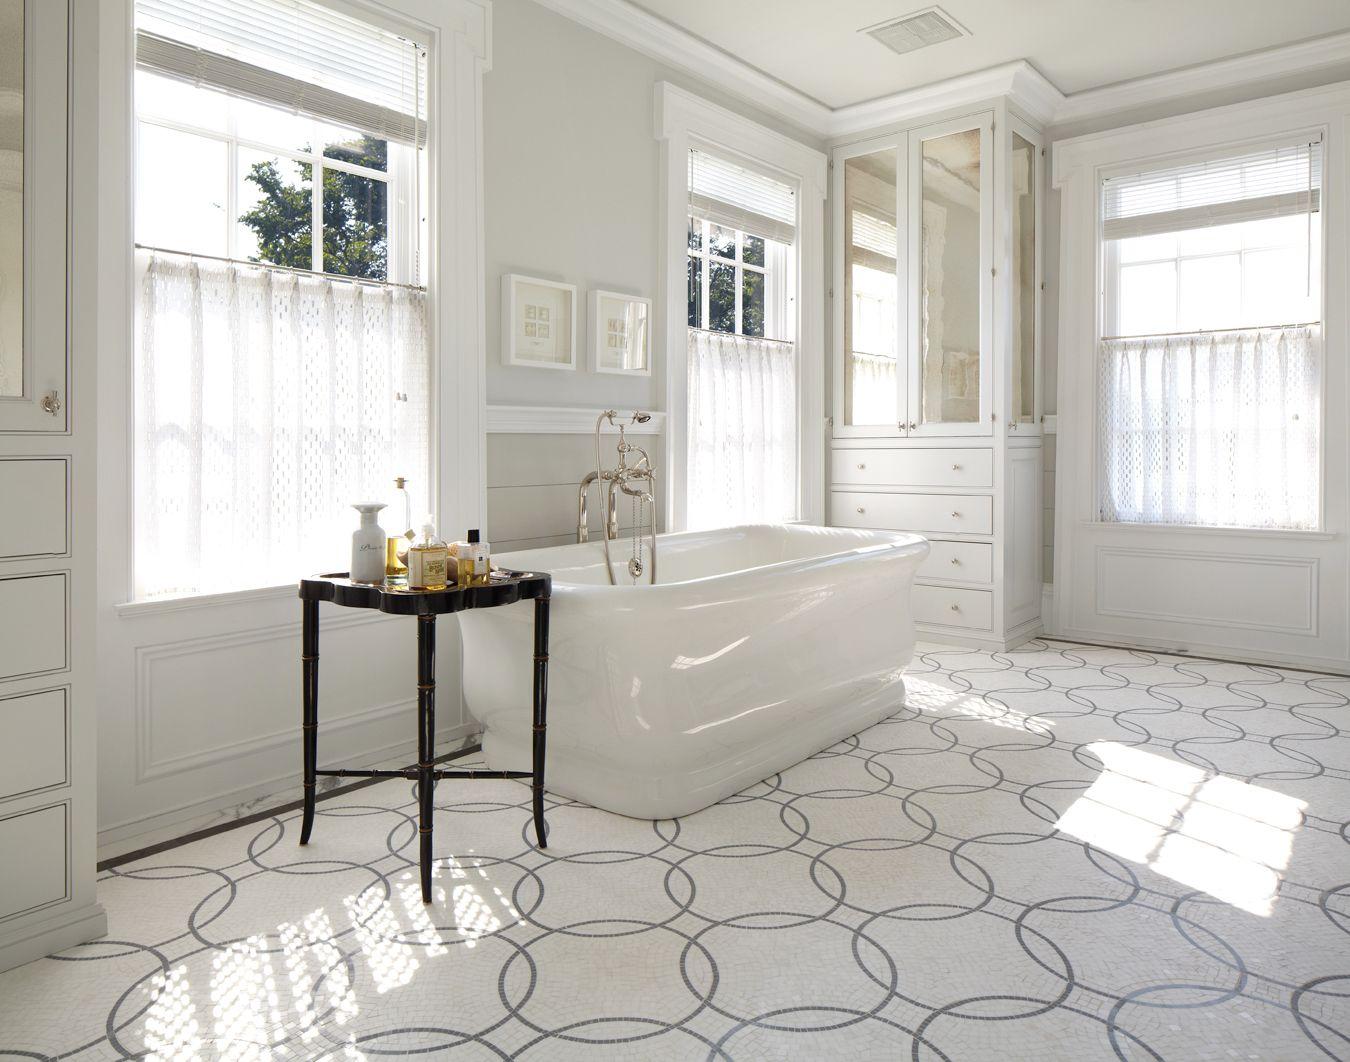 asd surfaces a francois & co. company | wood | stone | tile